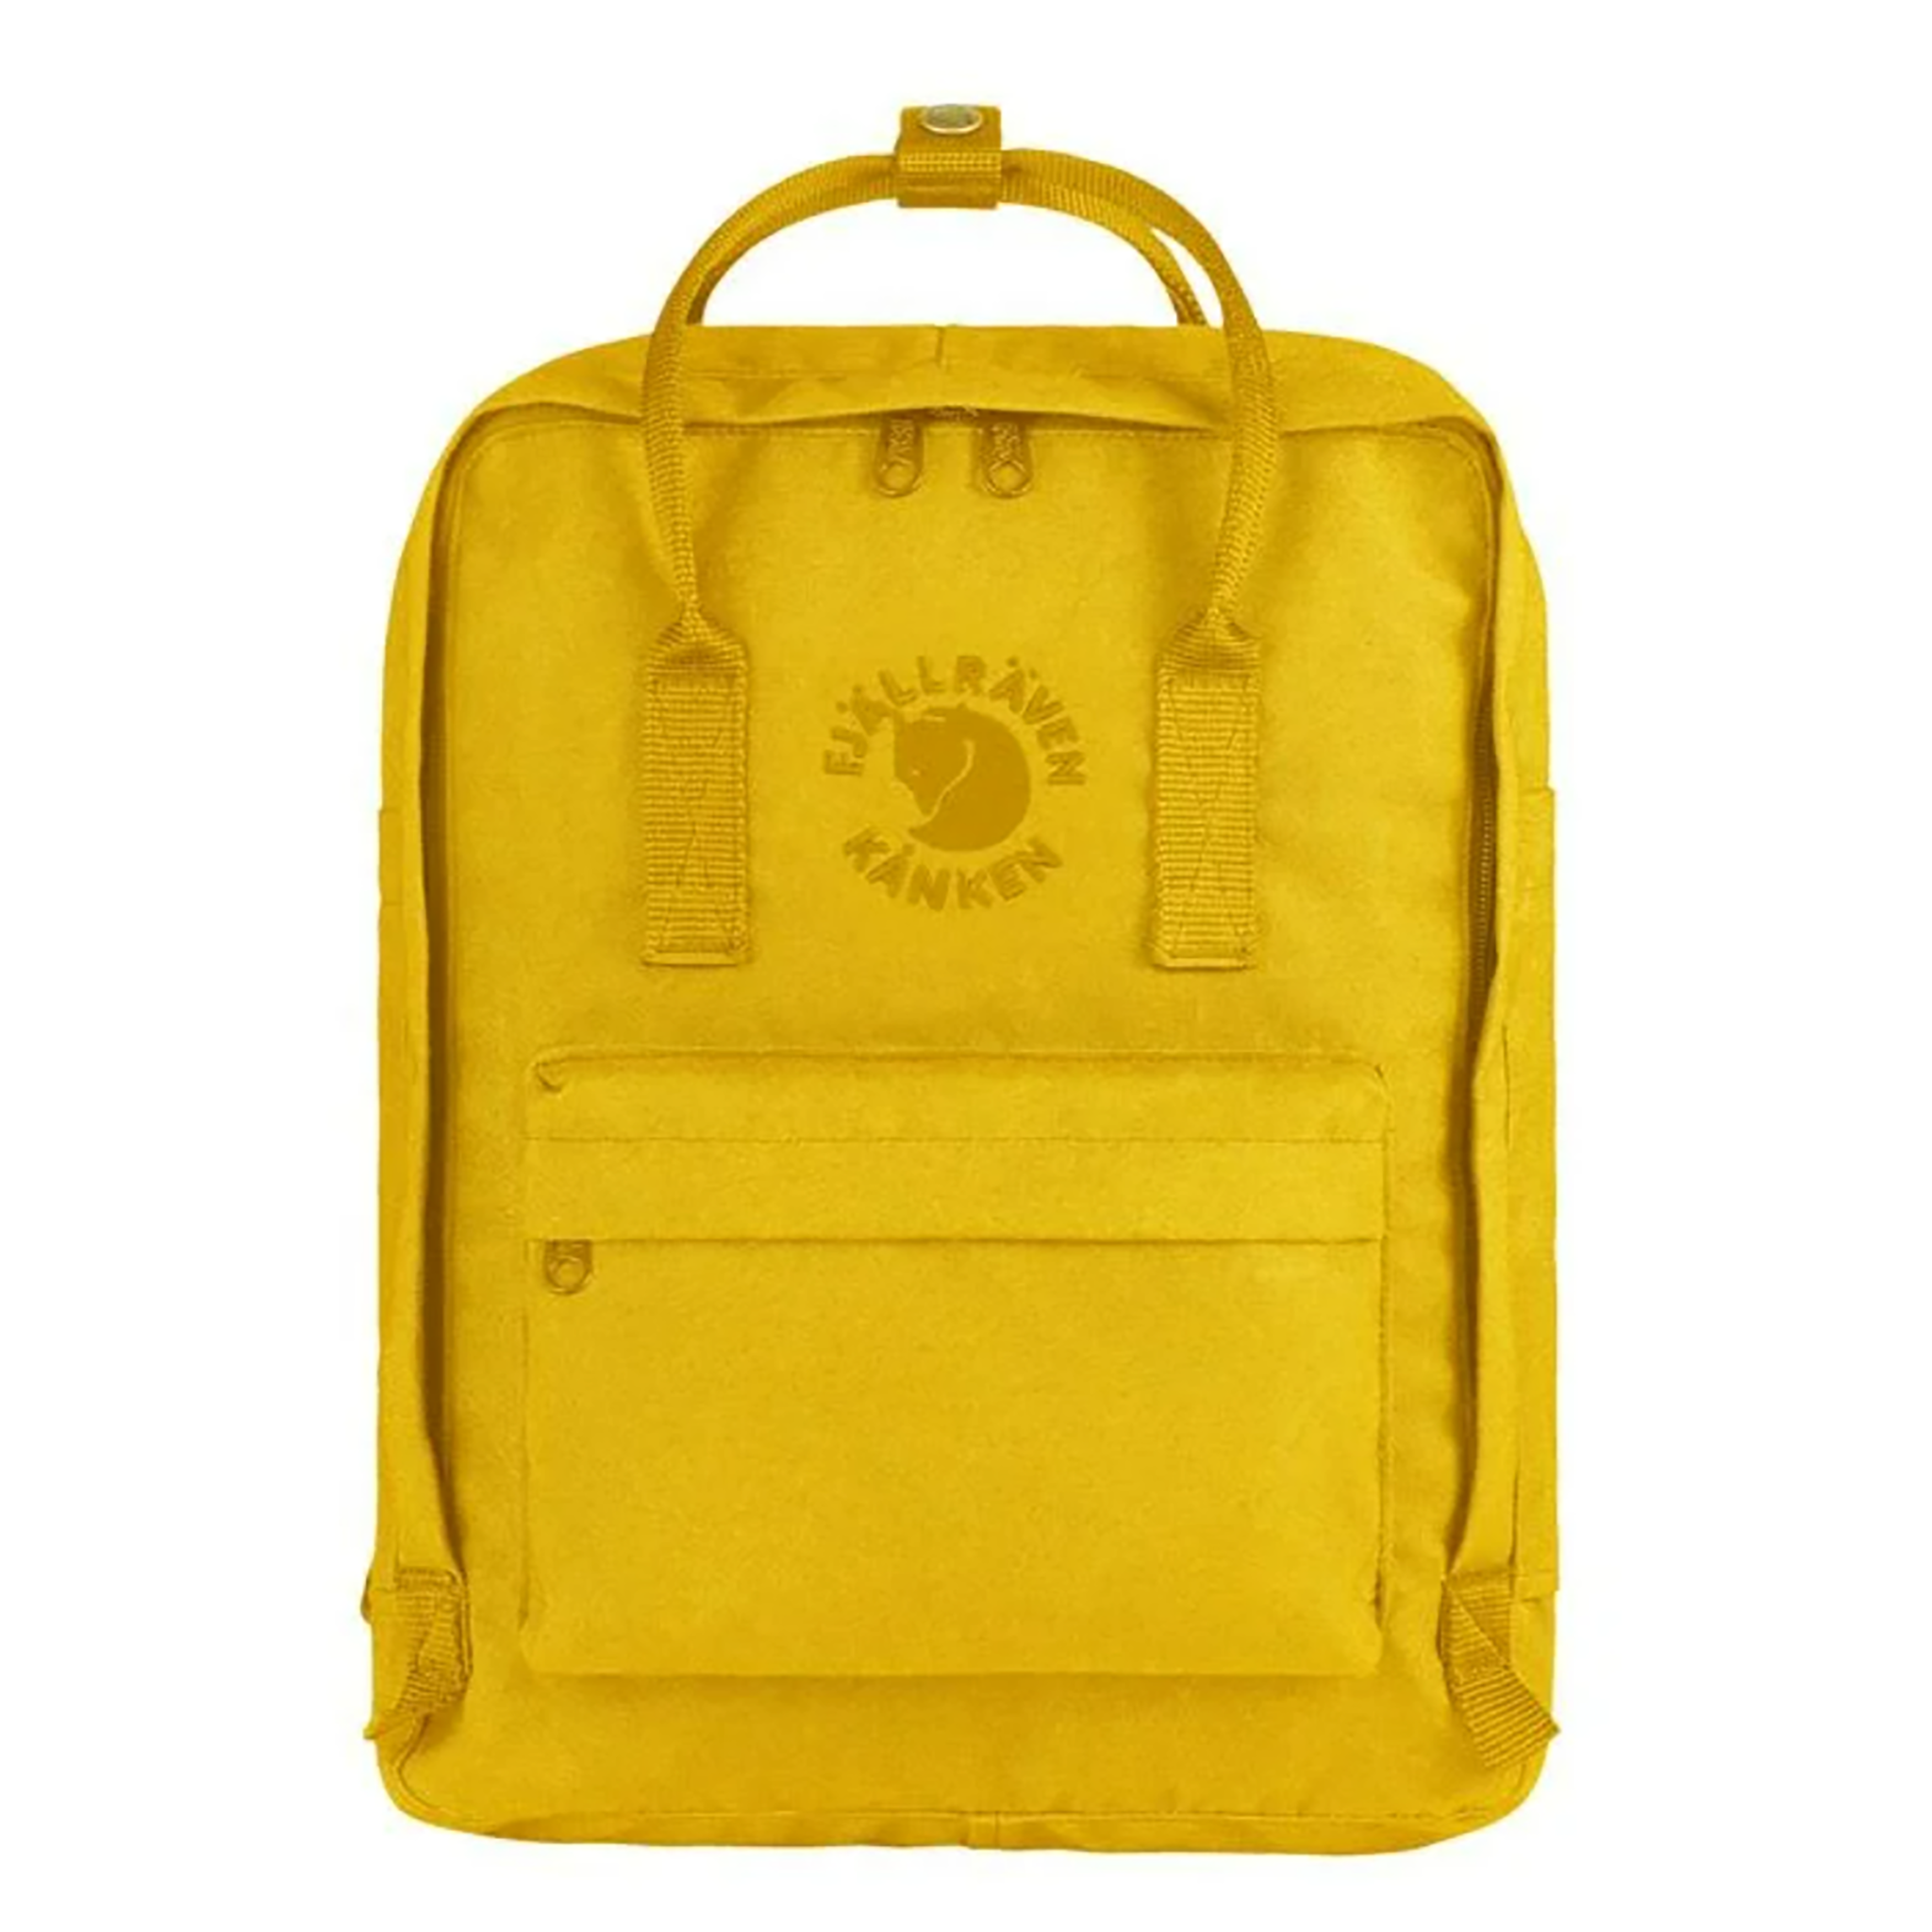 Re-Kanken 12 - Sunflower Yellow-1